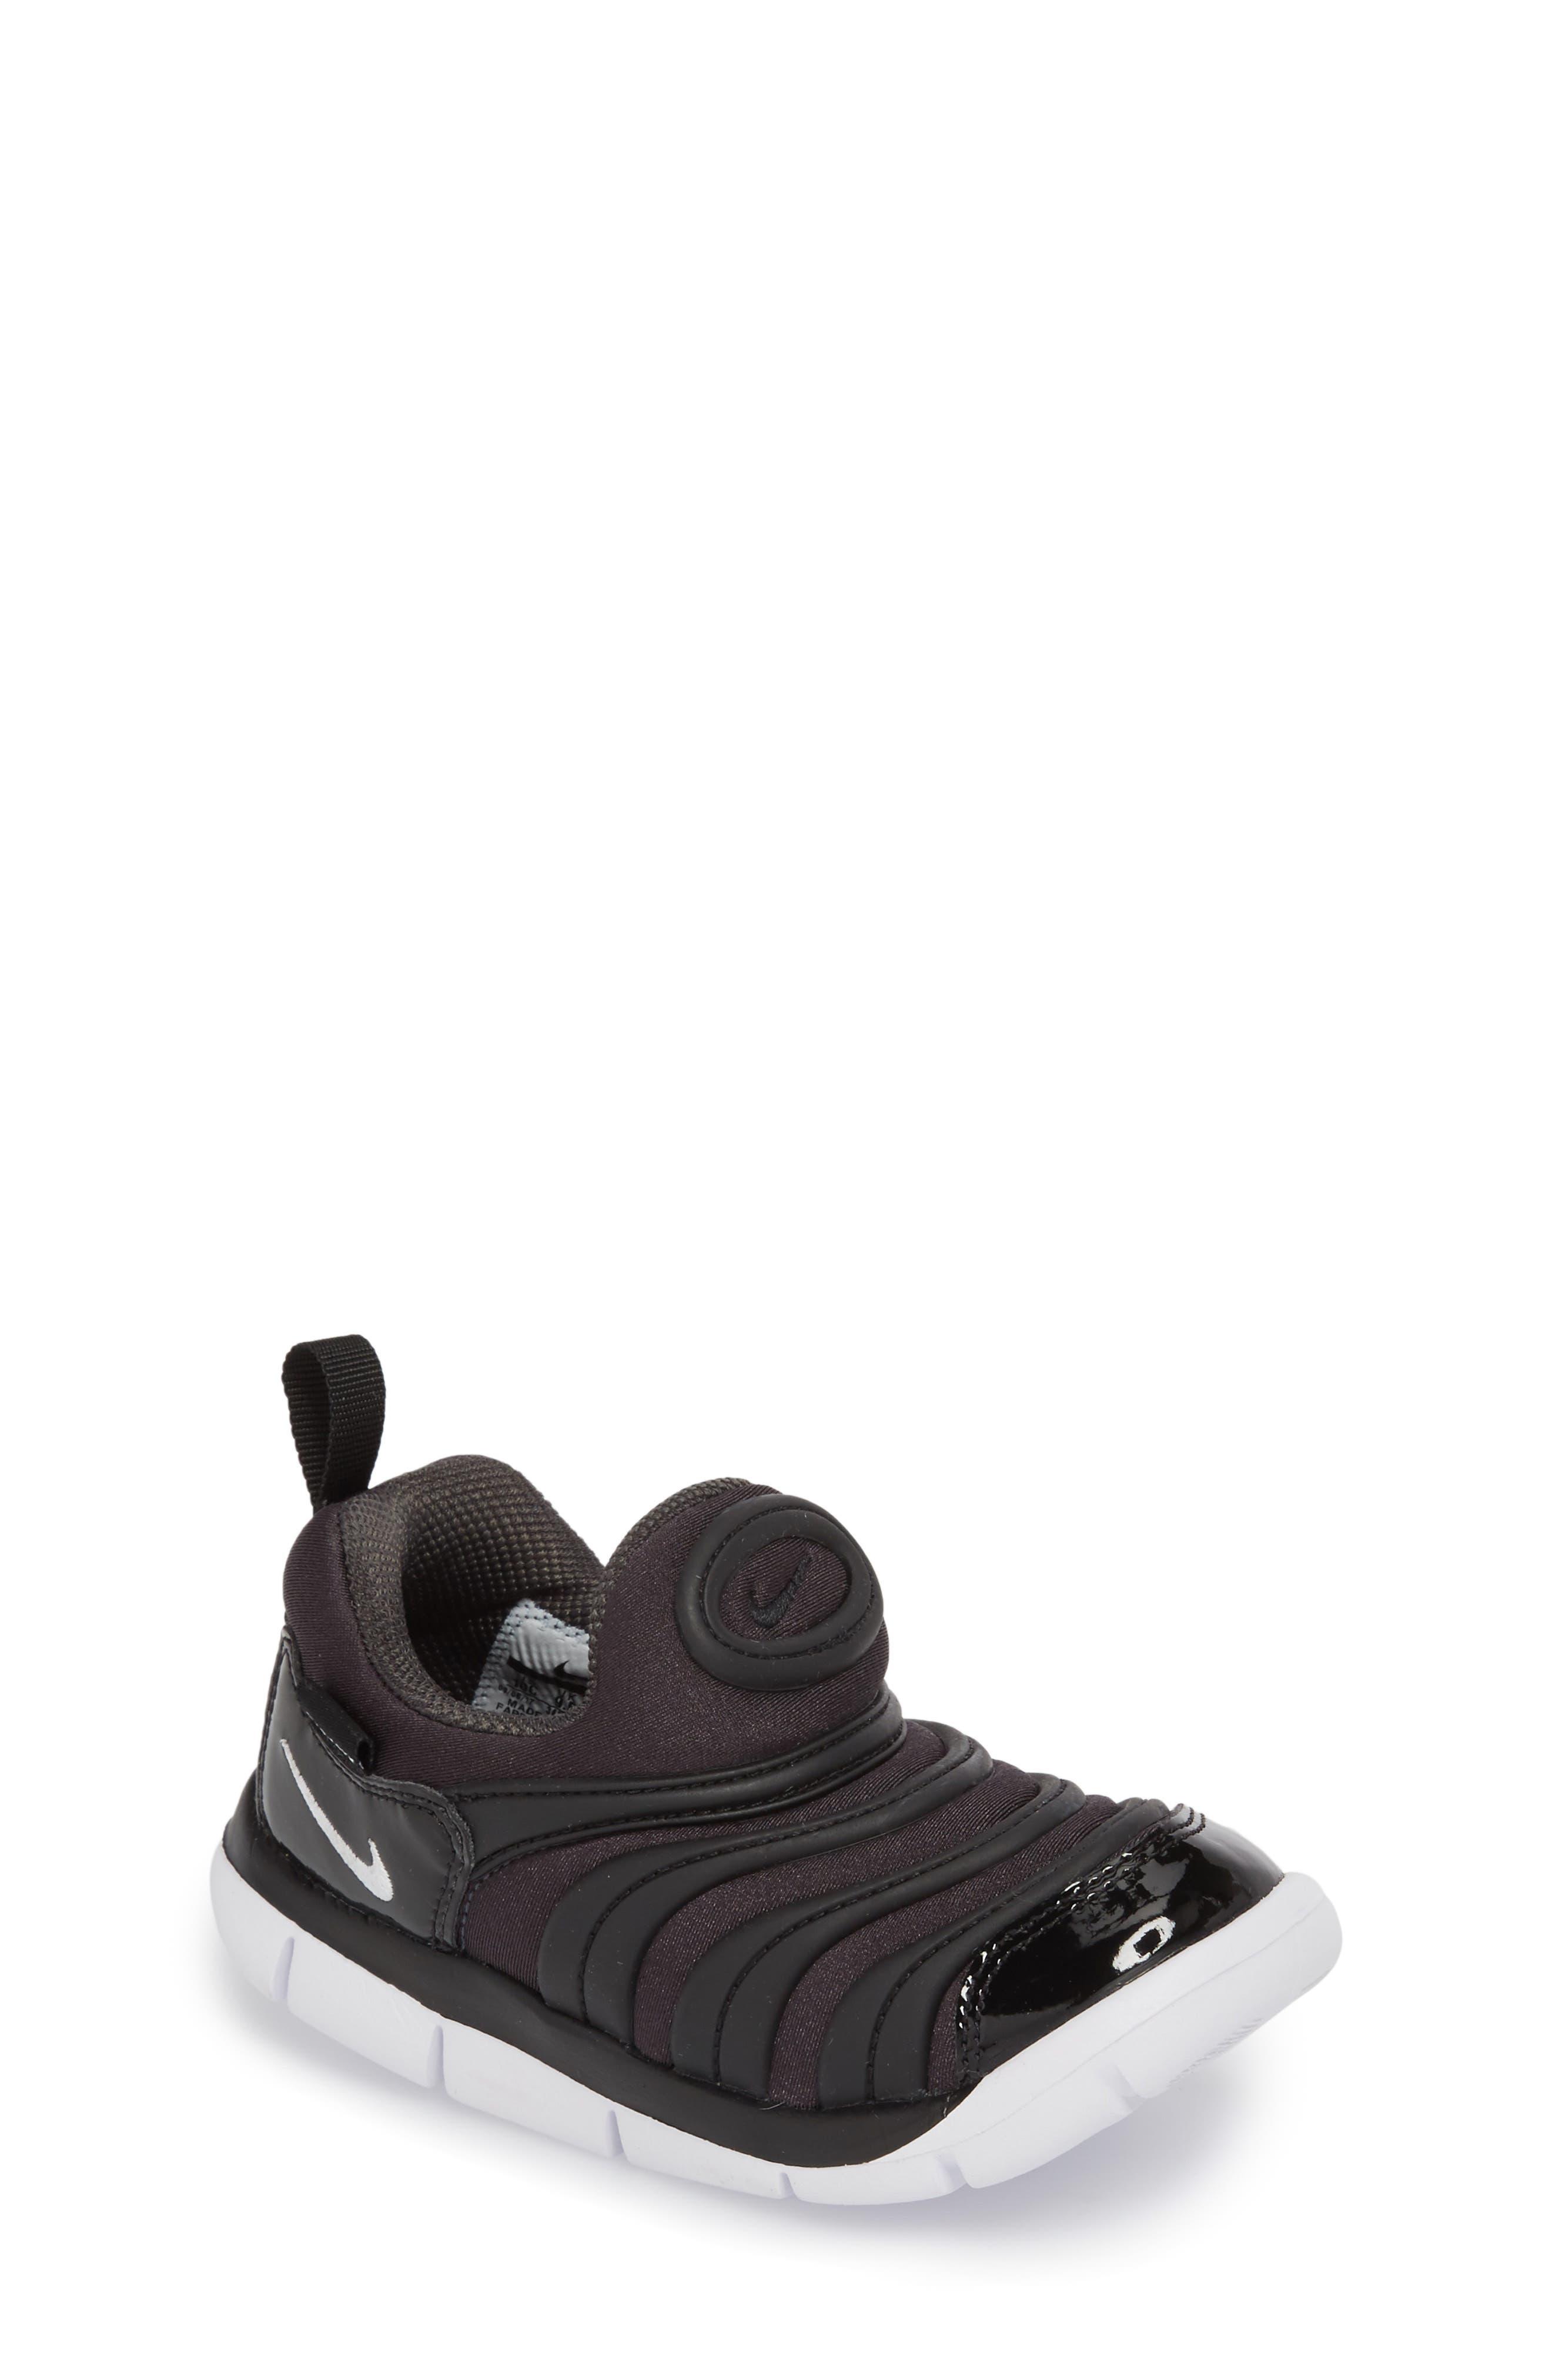 Dynamo Free Sneaker,                             Main thumbnail 1, color,                             ANTHRACITE/ WHITE/ BLACK